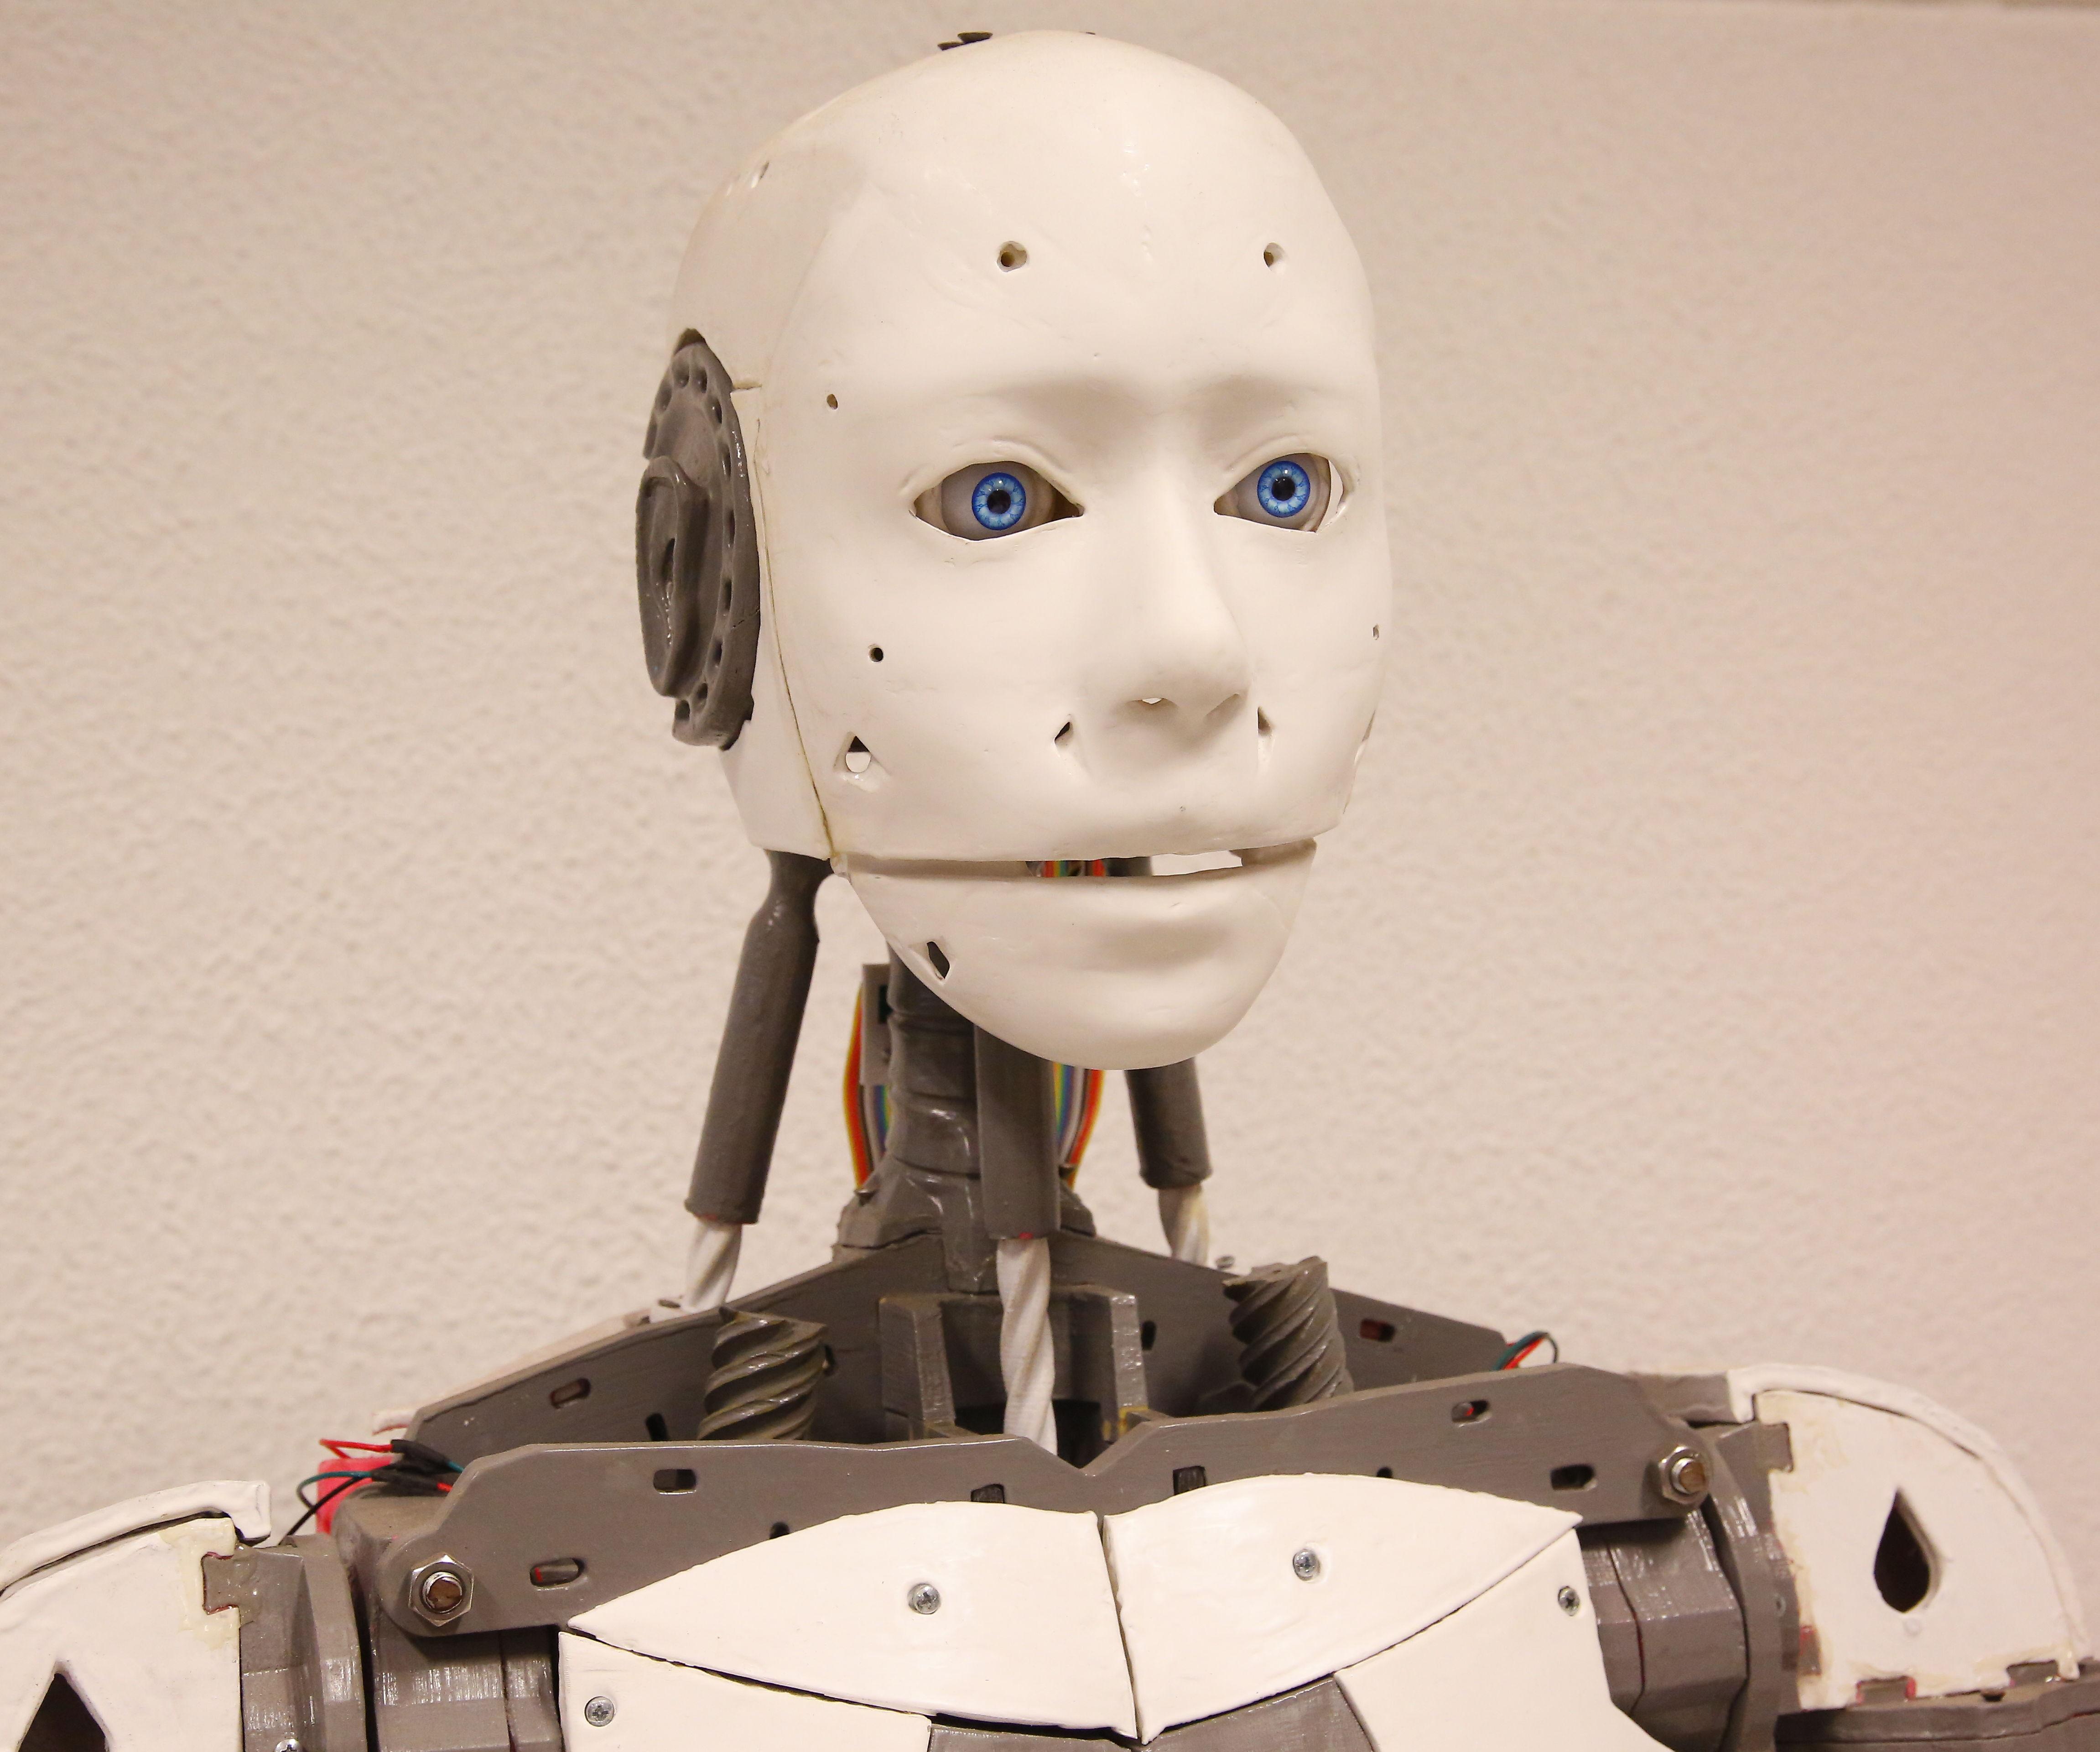 3D Printed Humanoid Robot - InMoov (My Photo Build)